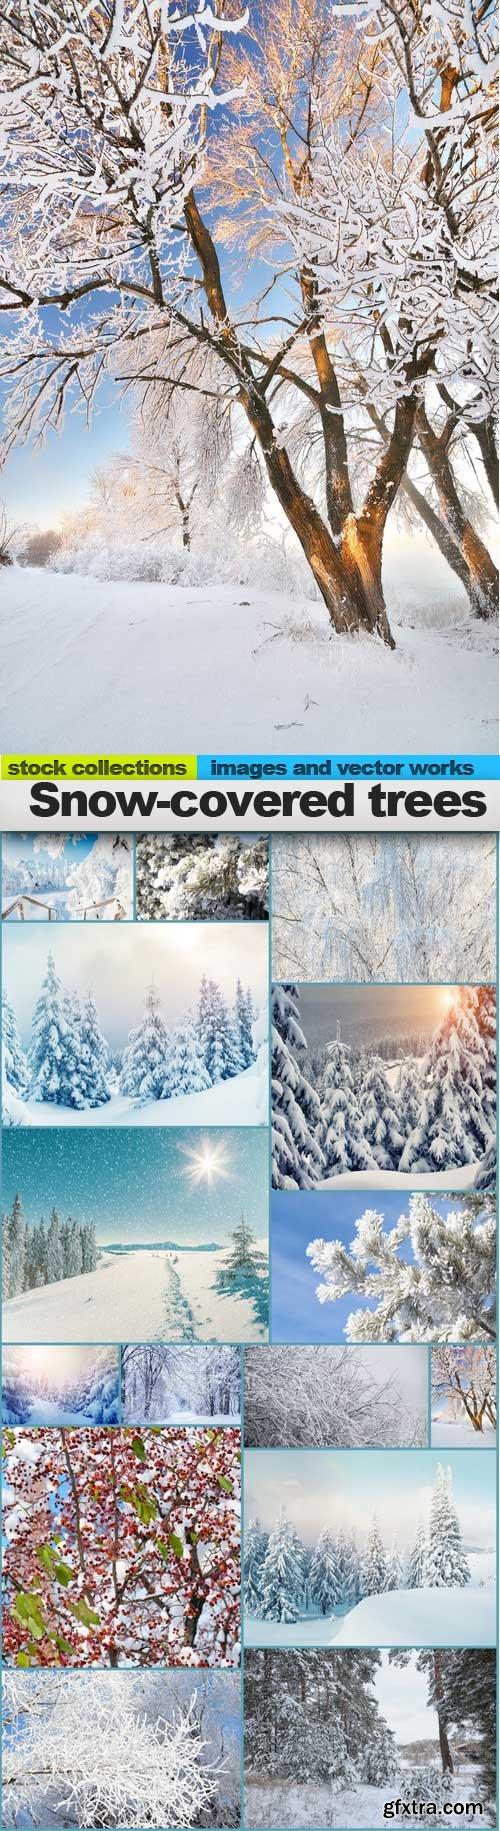 Snow-covered trees, 15 x UHQ JPEG